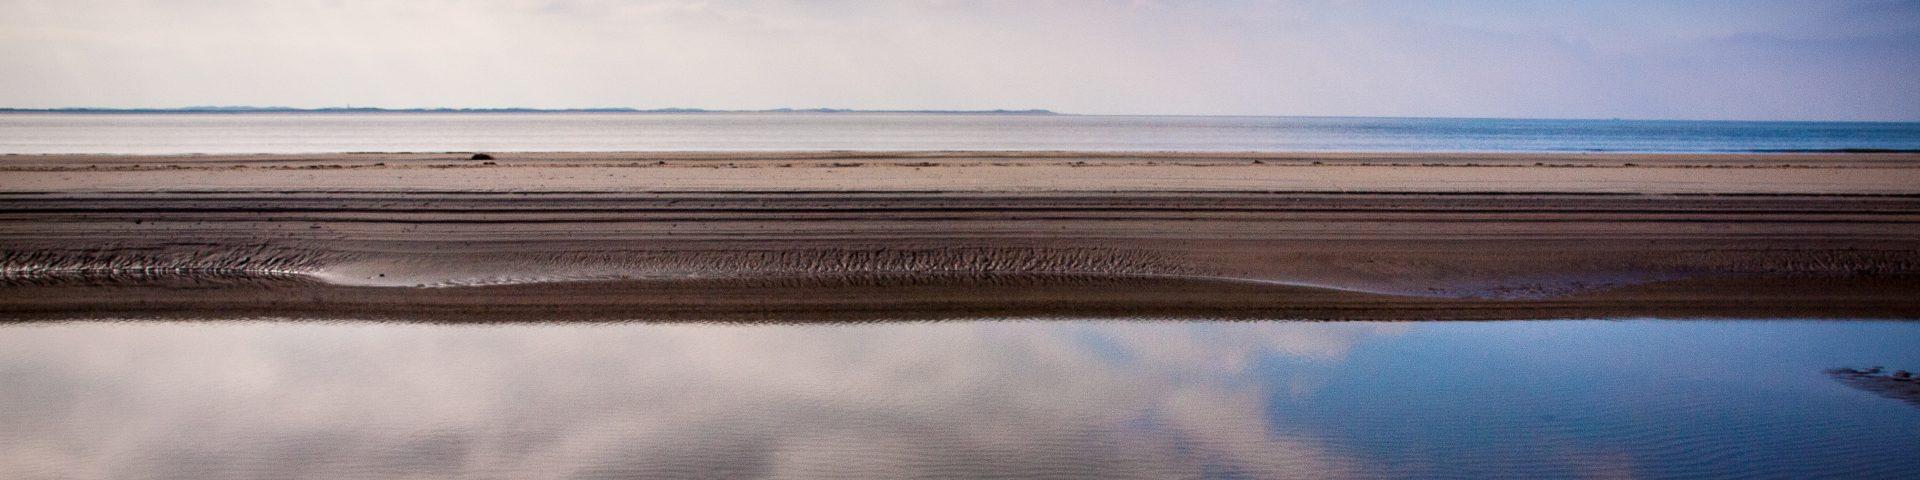 Rømø Strand bei Ebbe Urlaub mit Baby